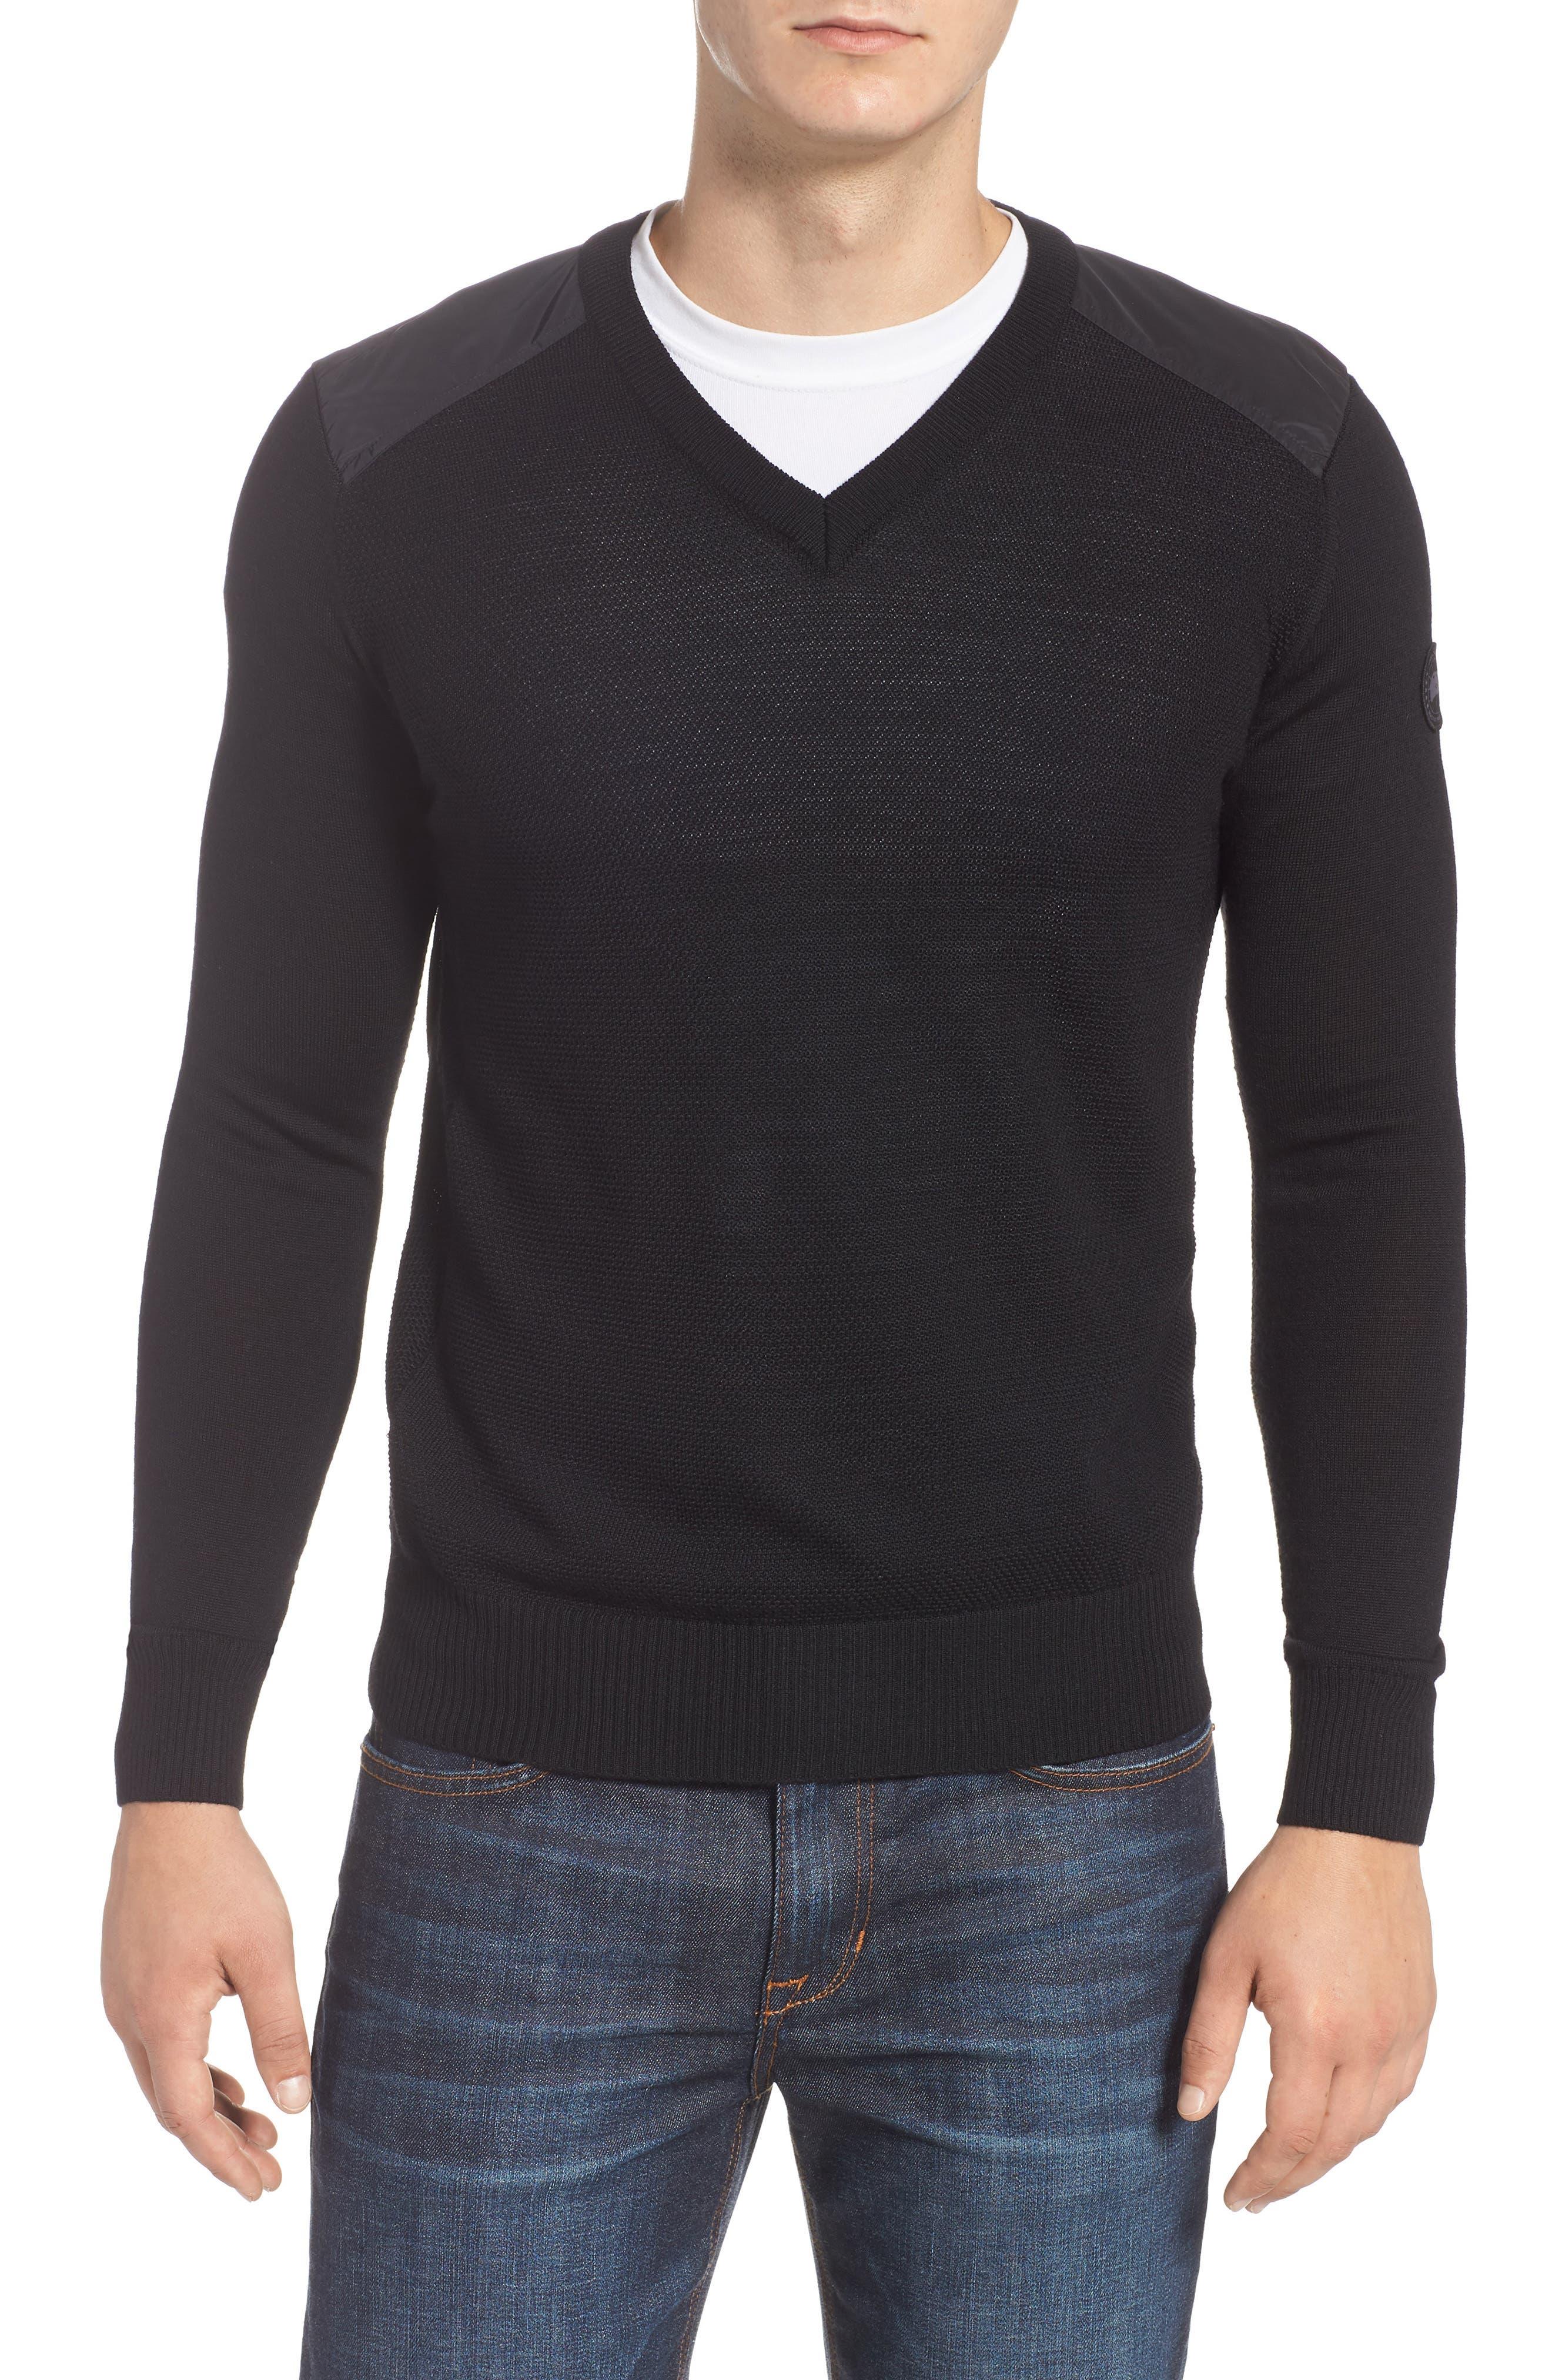 McLeod V-Neck Regular Fit Merino Wool Sweater,                             Main thumbnail 1, color,                             BLACK